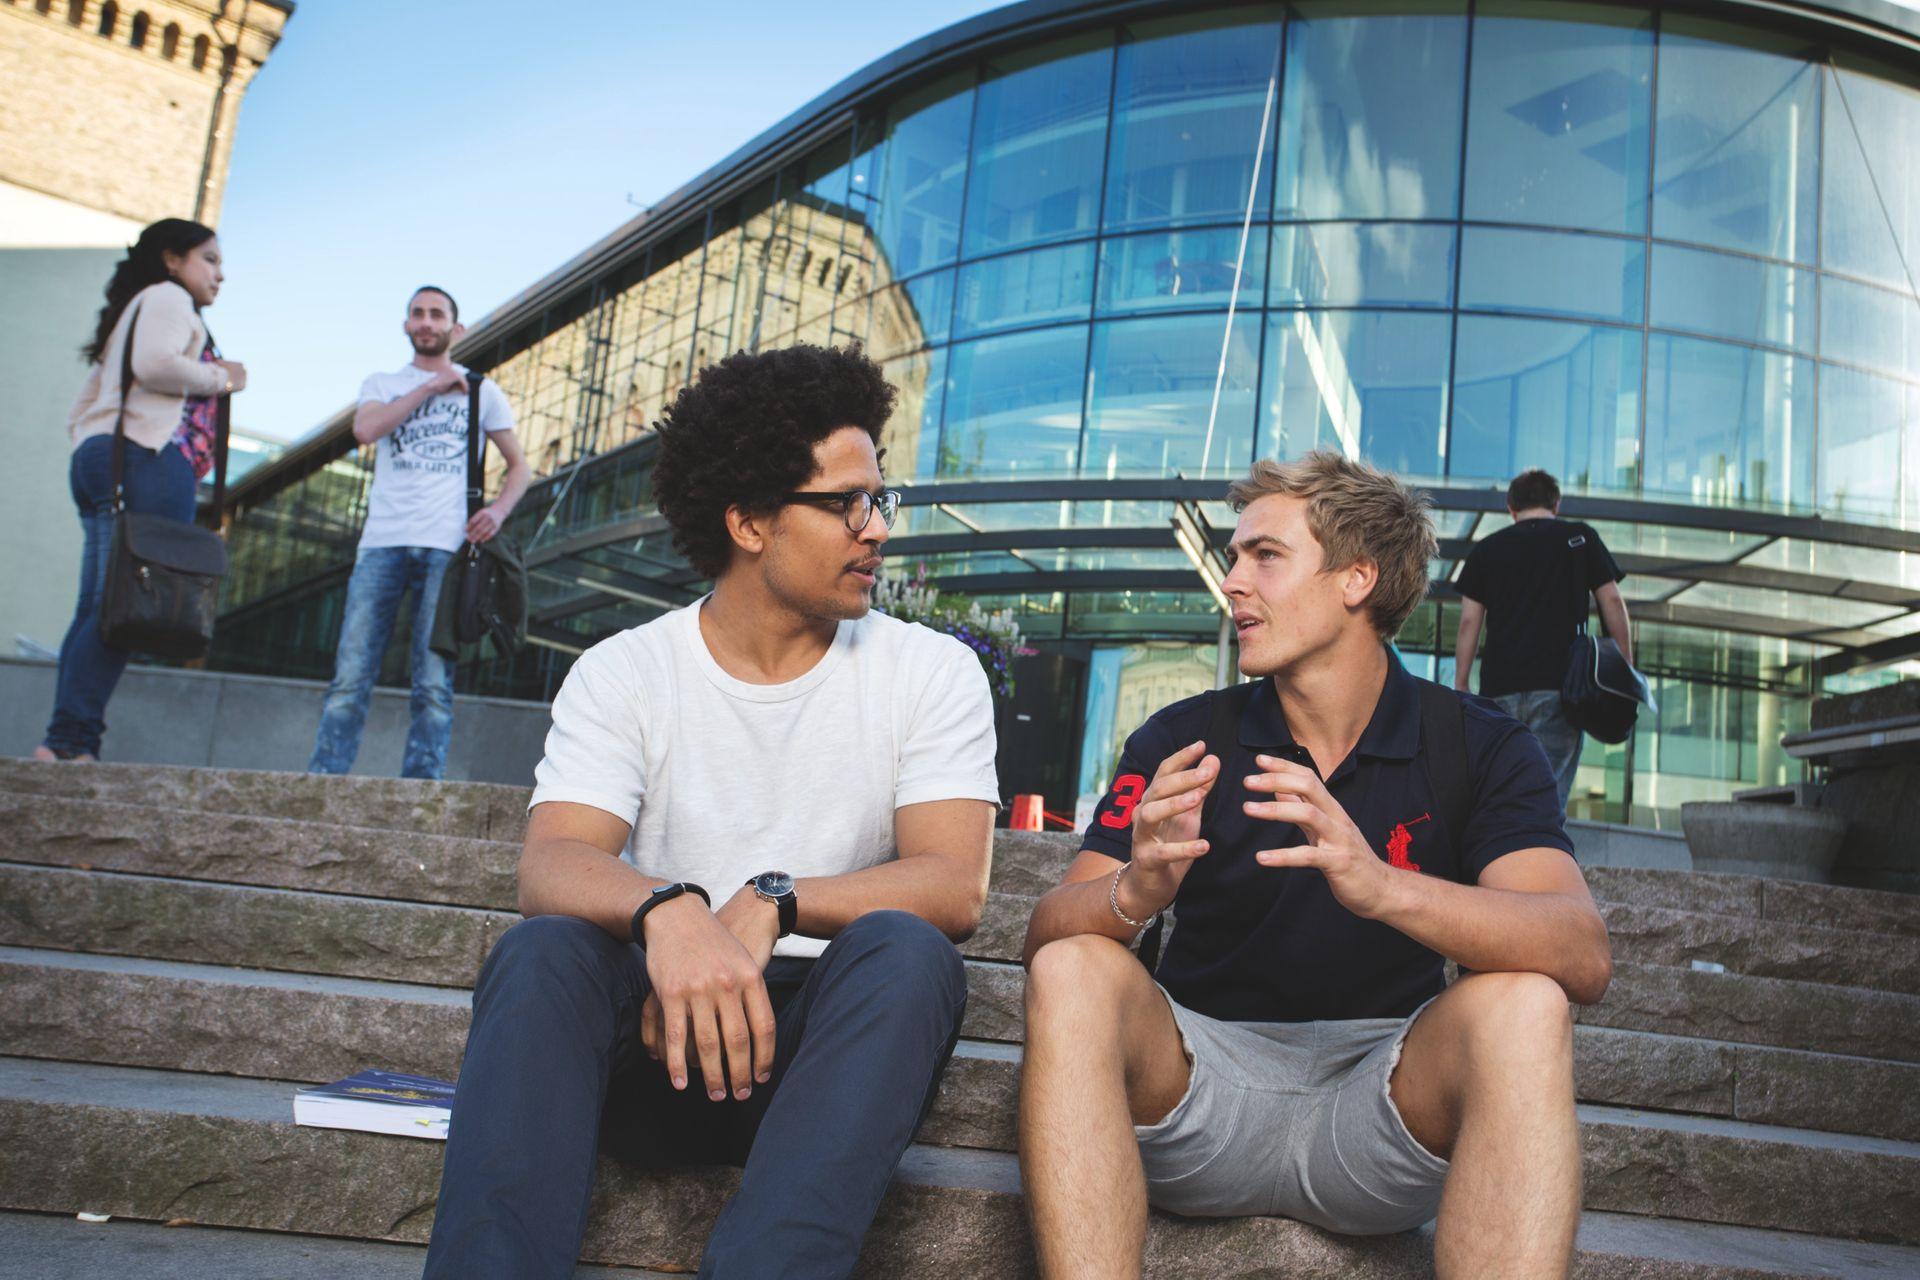 Students talking in sweden